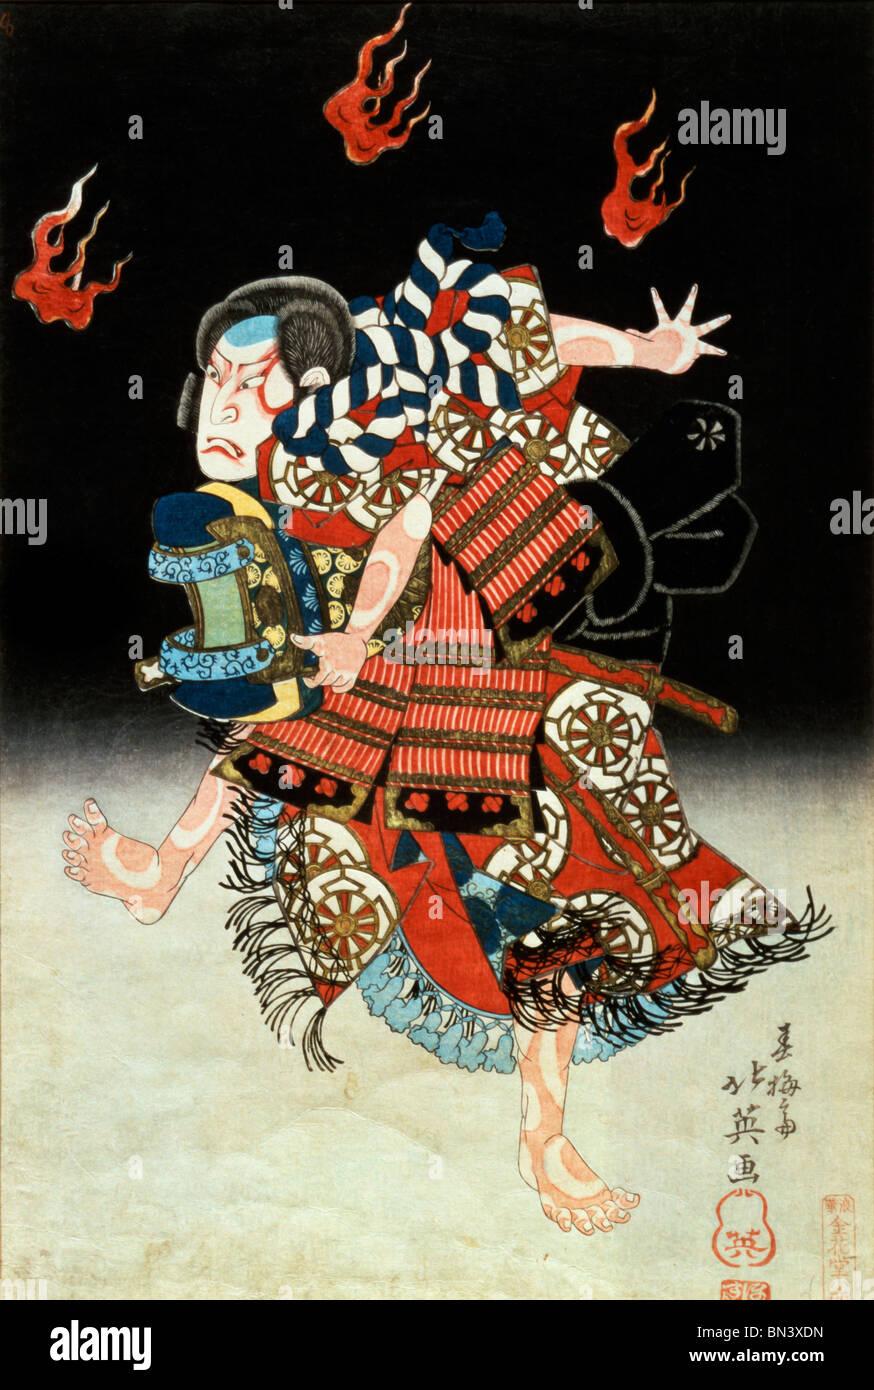 Nakamura Shikan II comme Tadanobu, par Shunbaisai Hokuei. Japon, 1835 Banque D'Images